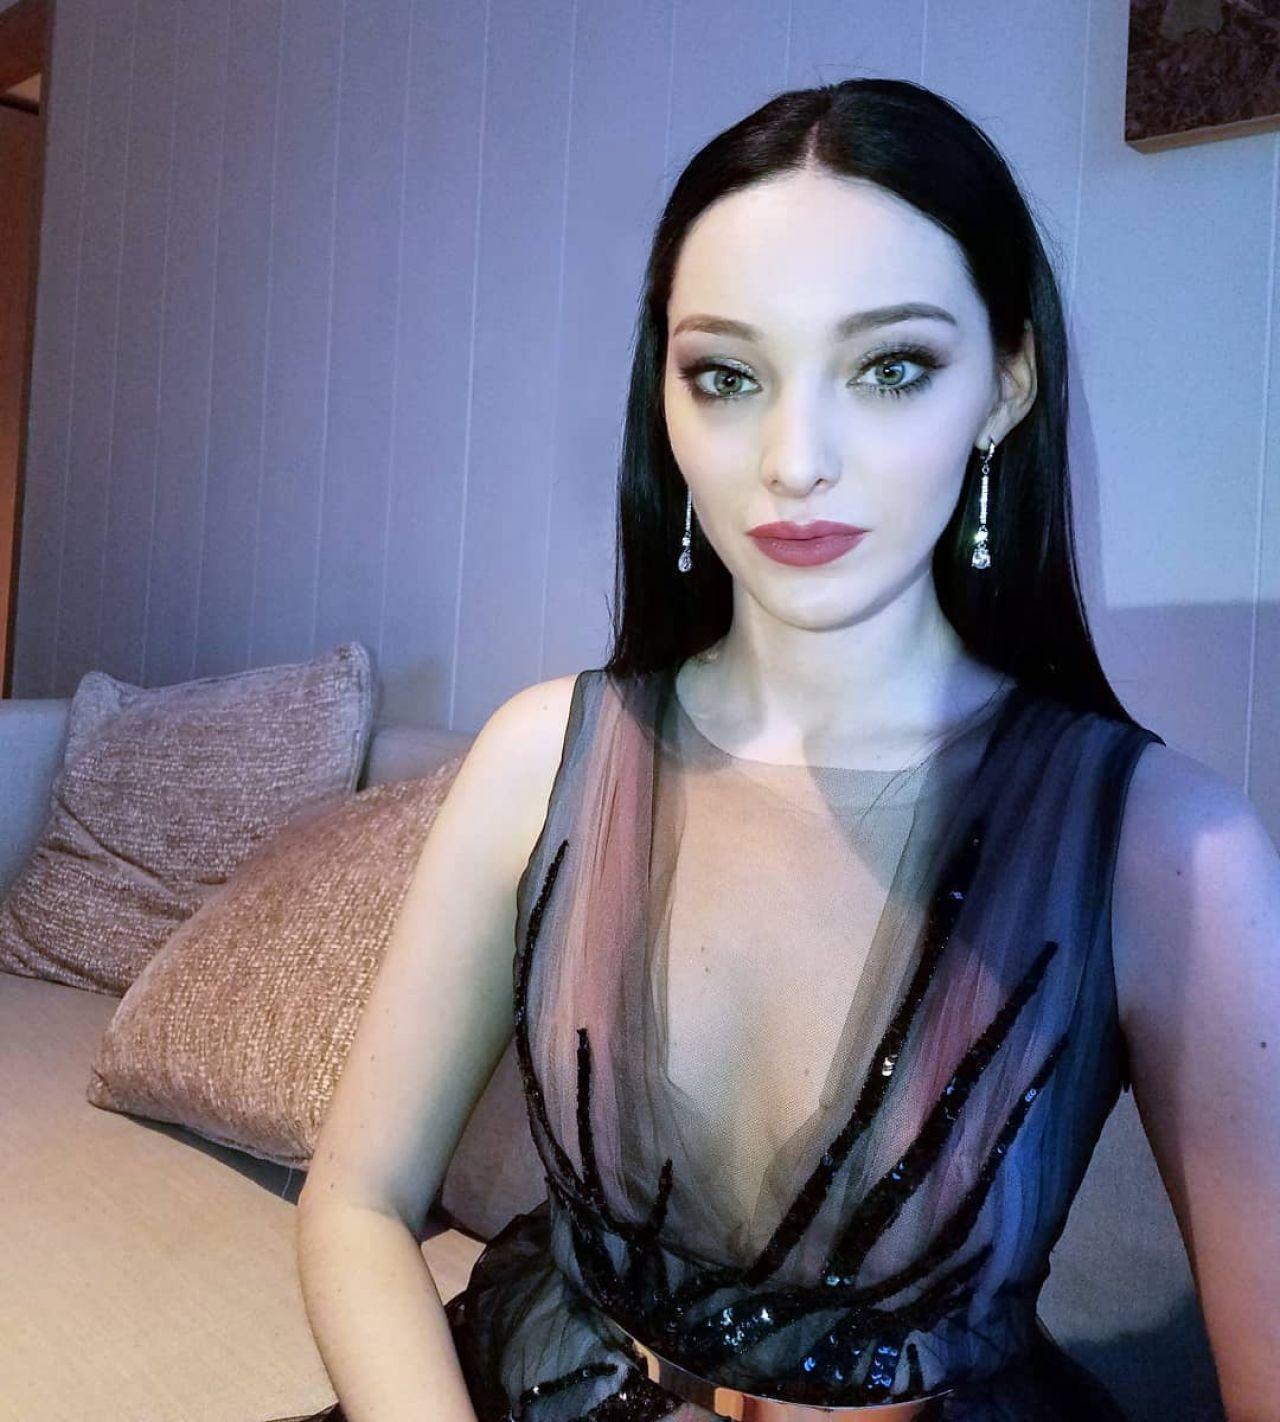 Celebrity Natasha BCelebrityett nudes (93 photo), Topless, Fappening, Selfie, butt 2017